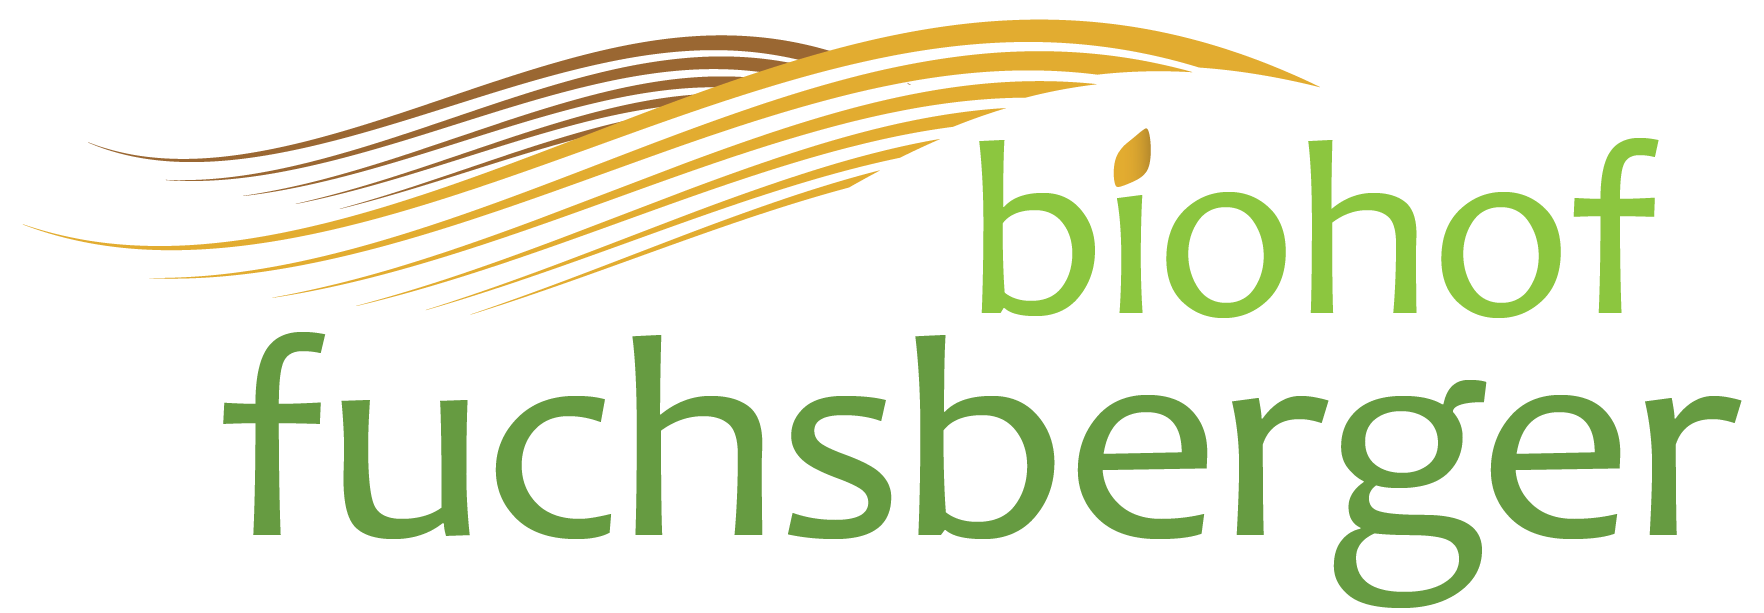 biohof_fuchsberger_logo